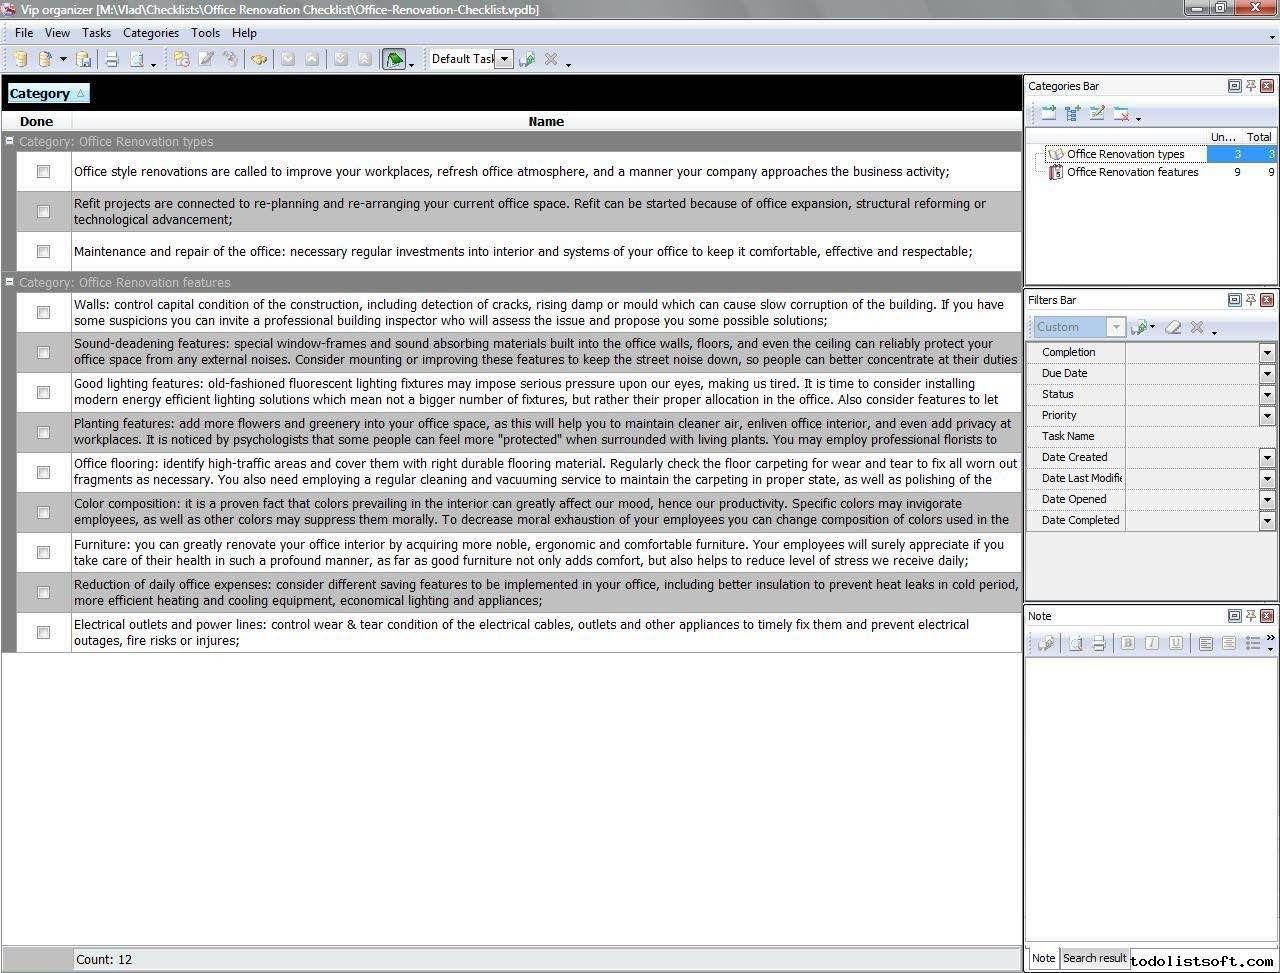 Office Supply Spreadsheet in 2020 | Spreadsheet ...